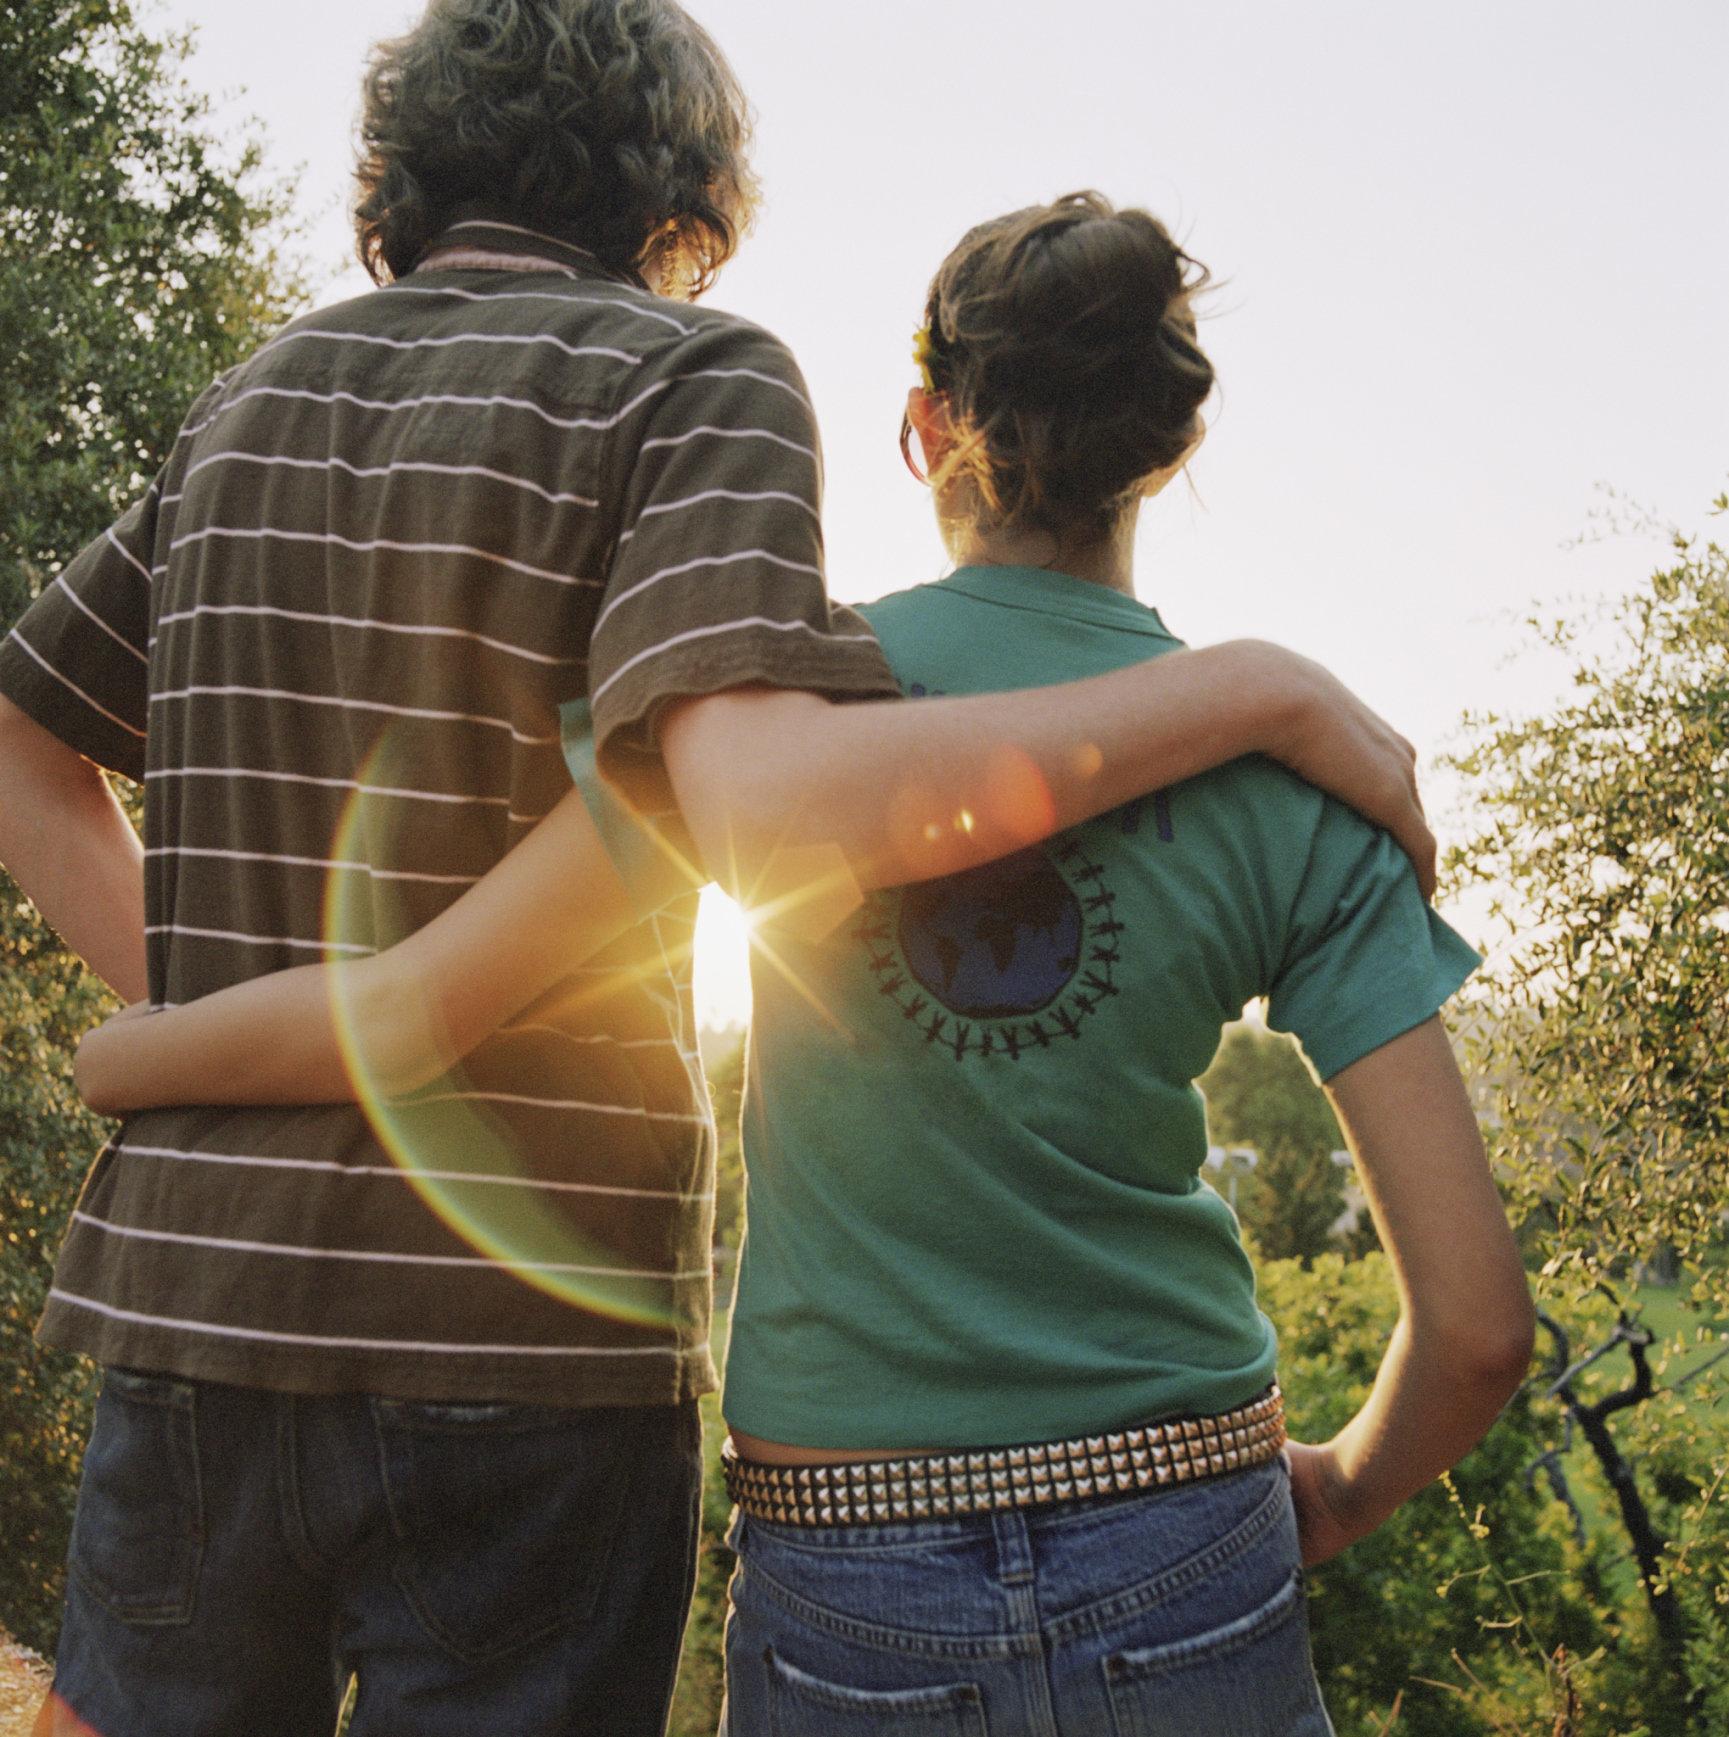 Affectionate teen couple